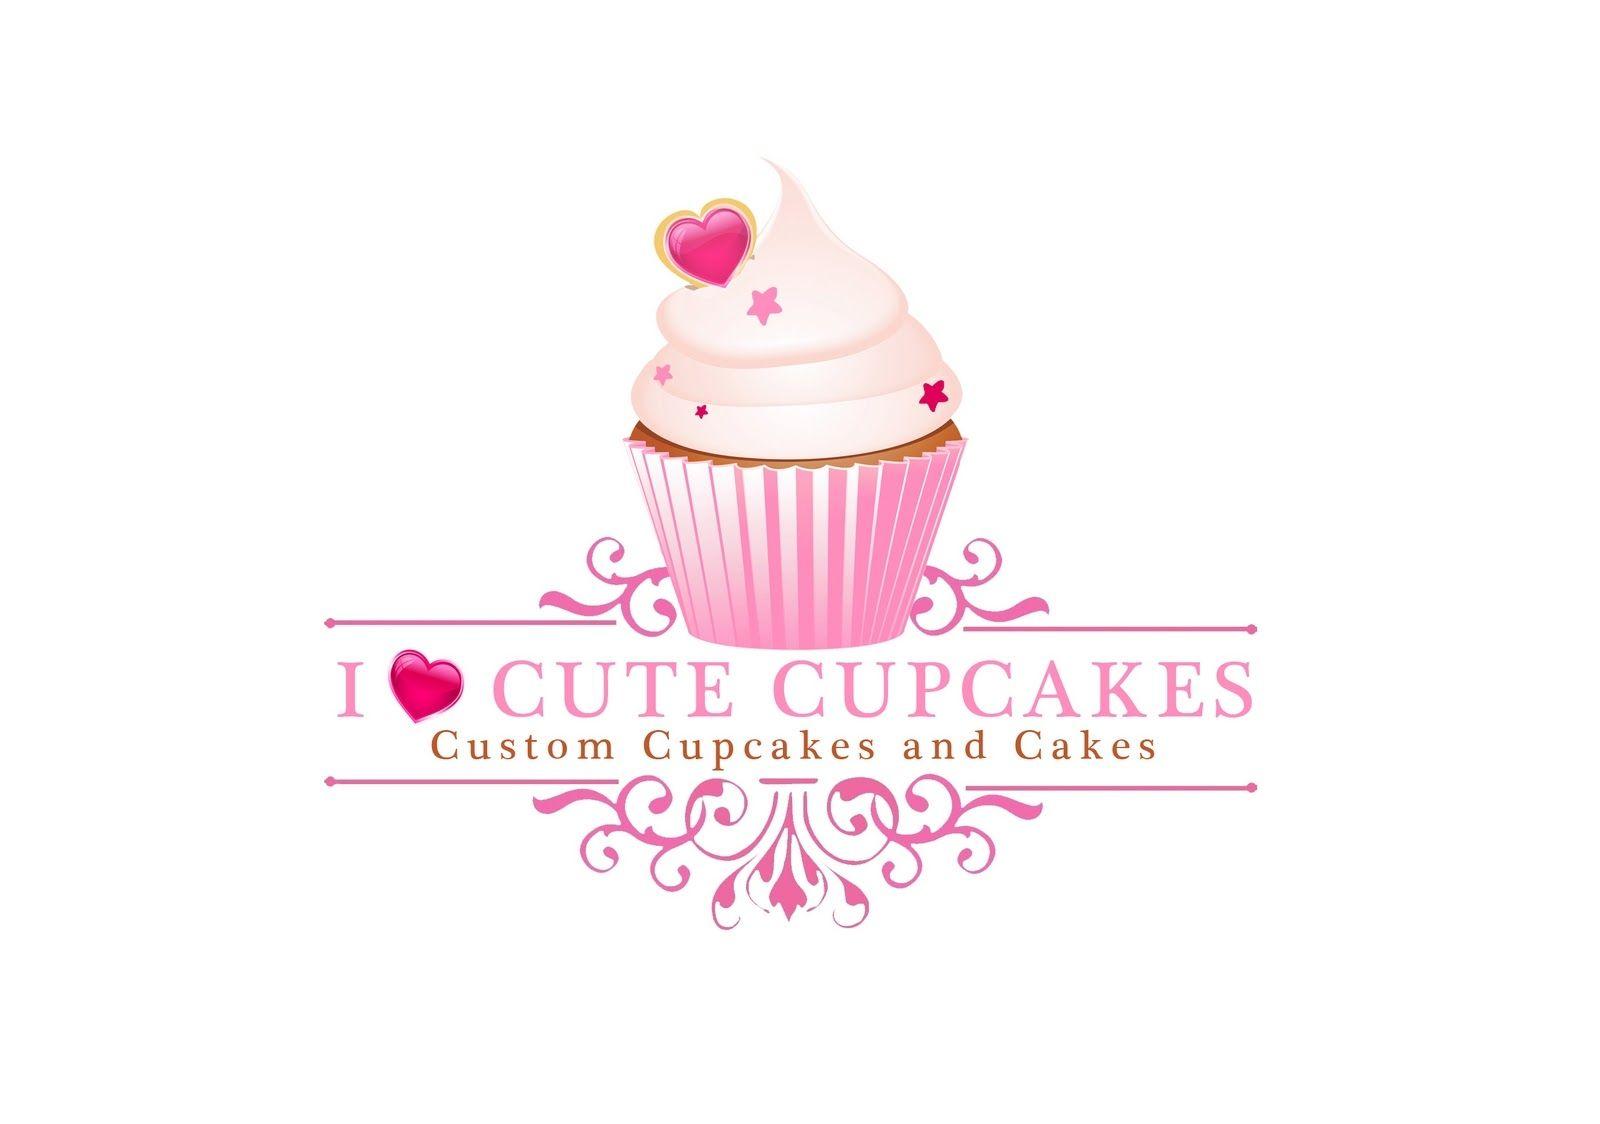 Cupcake Bakery Logo Ideas Unique Hijabista Of 47 Awesome Cupcake